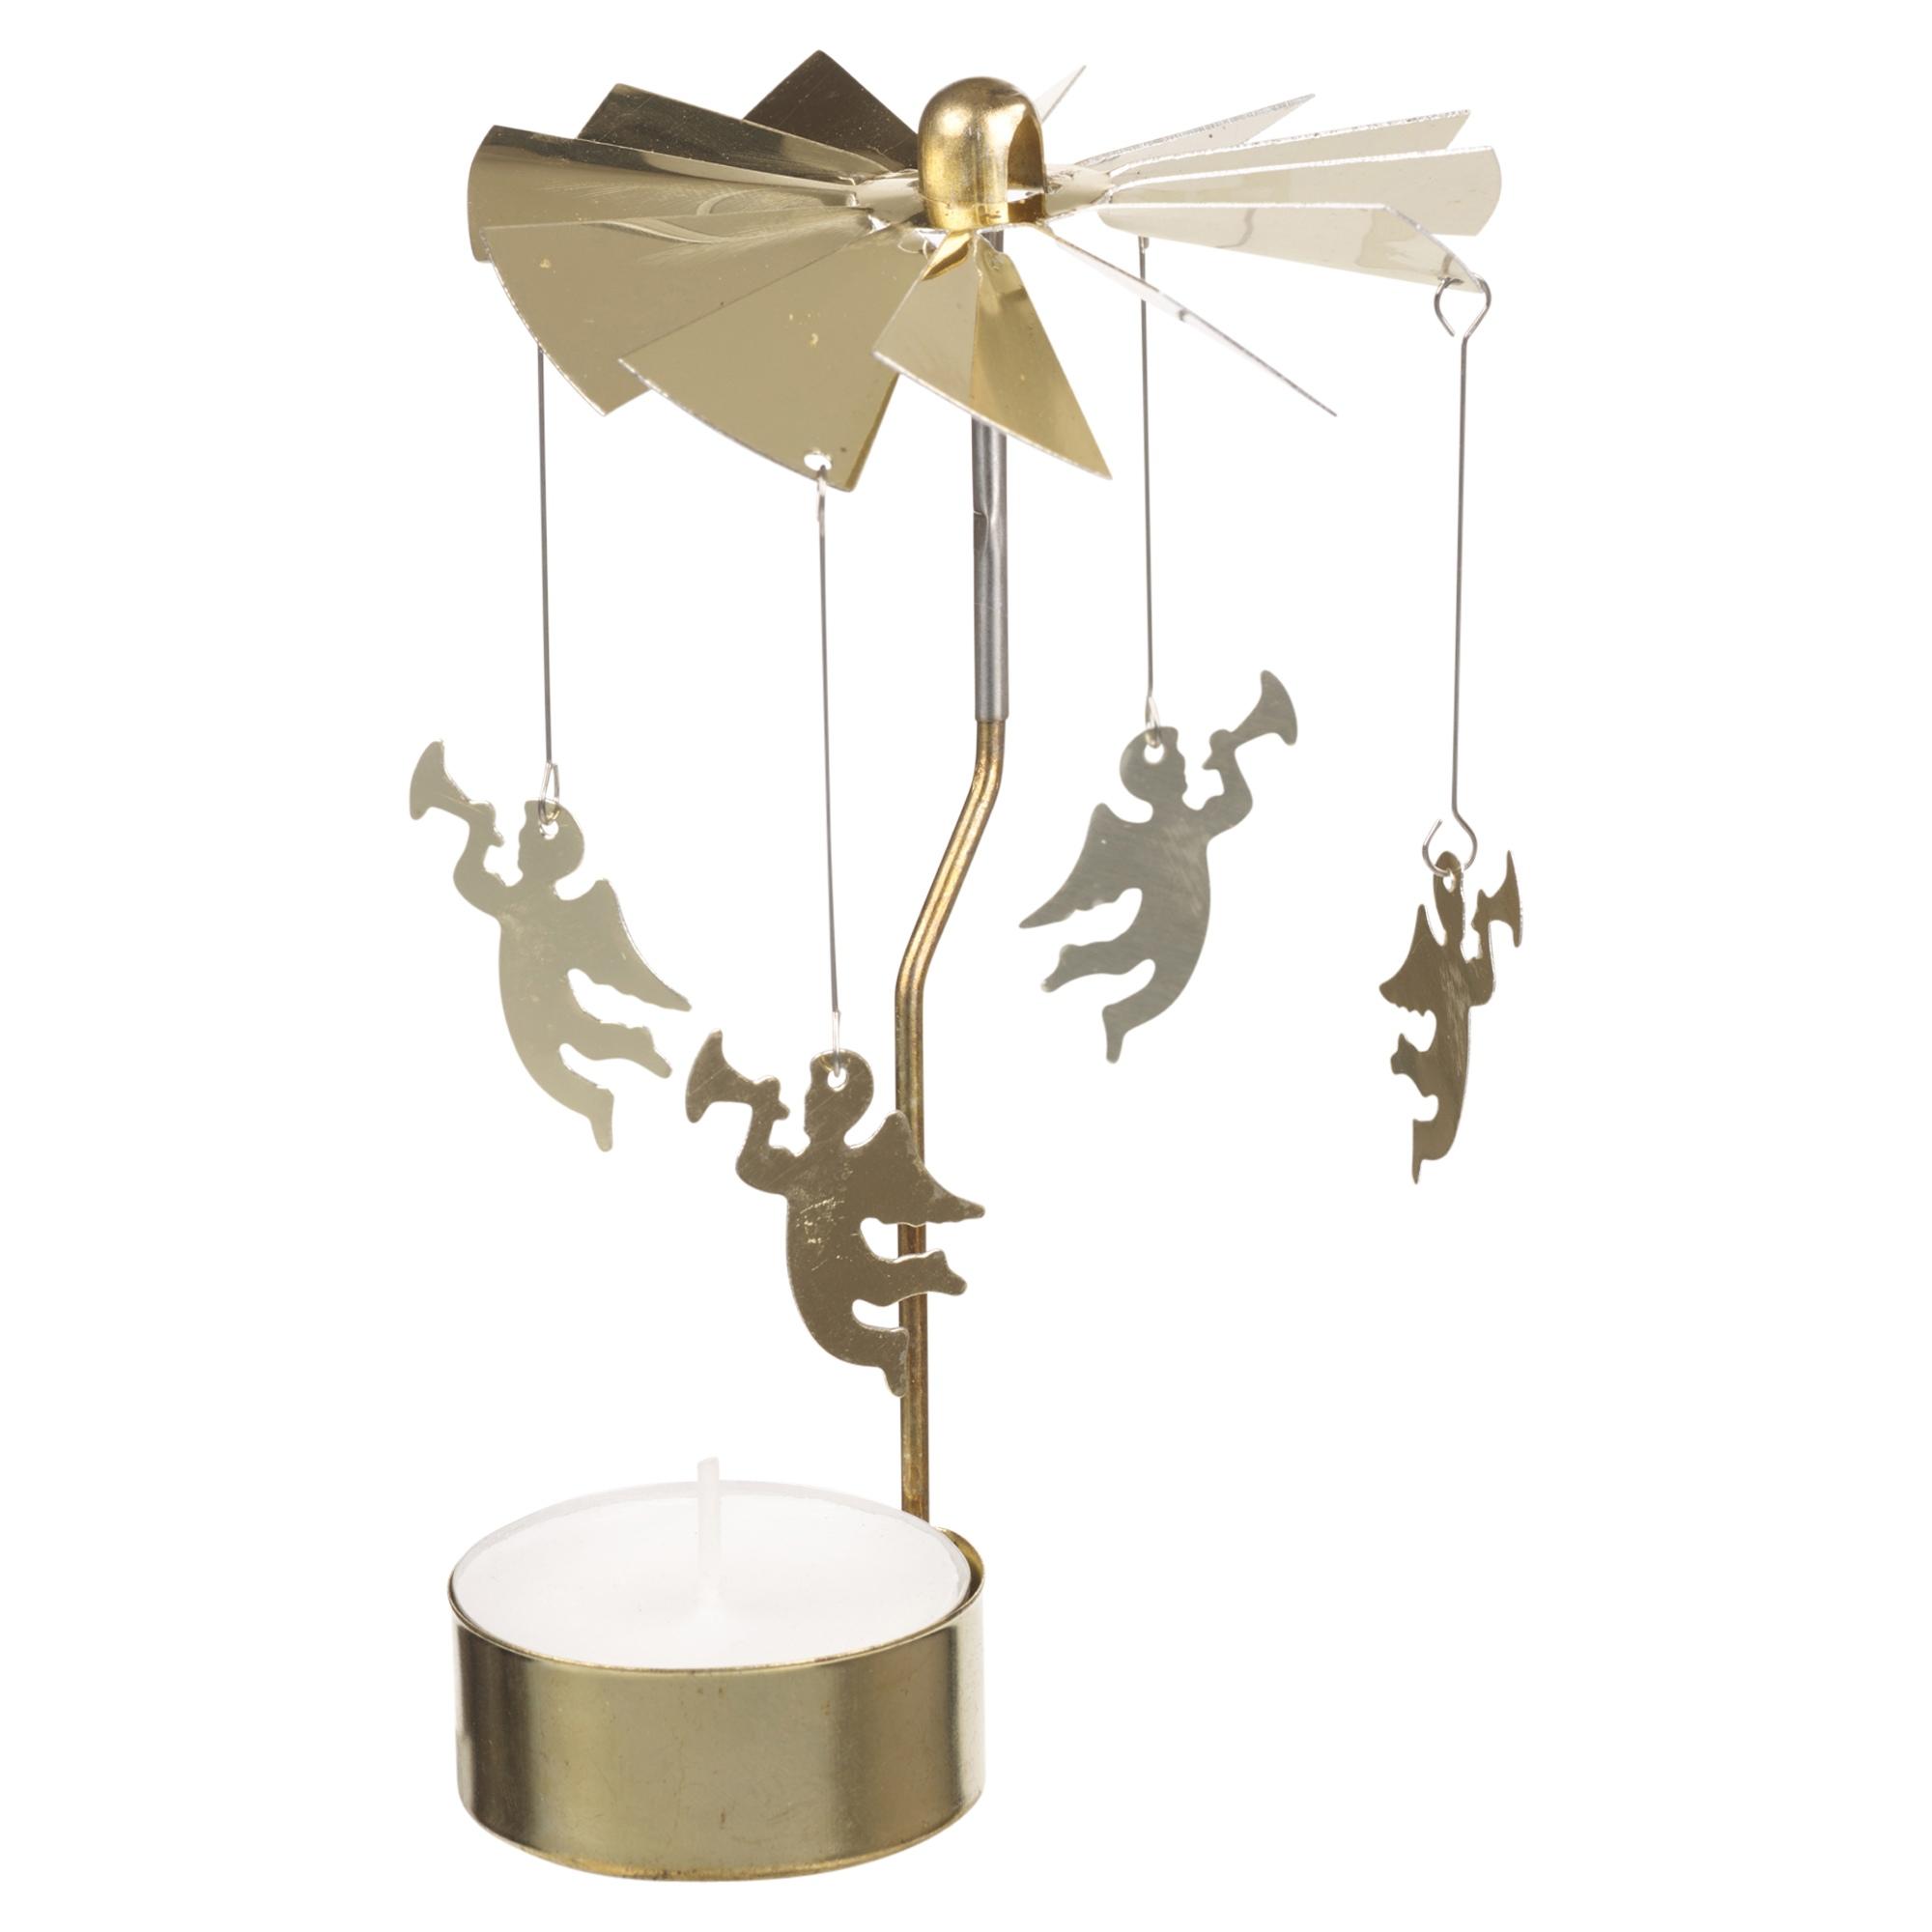 Tealight Carousel Rotary Tea Light Holder Christmas Gift Charms Spinning Candle Ebay